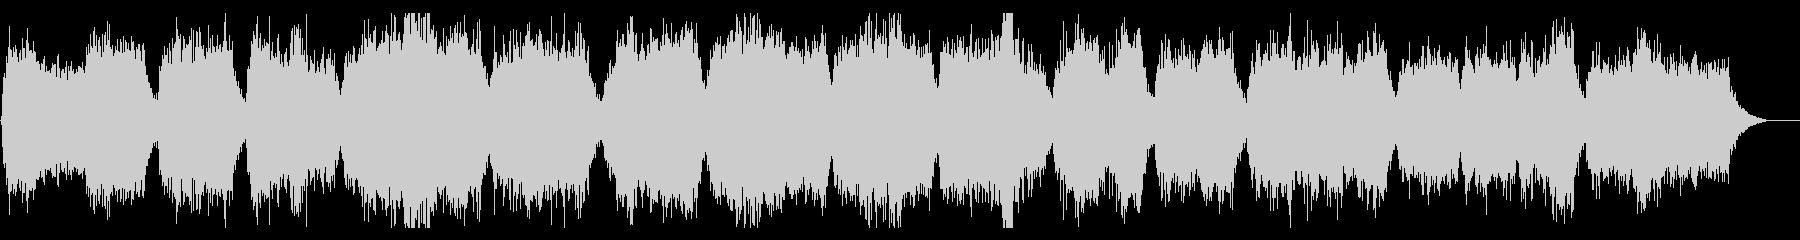 Urban legend ✡ Ikebo ★ Melancholy of the old man choir's unreproduced waveform